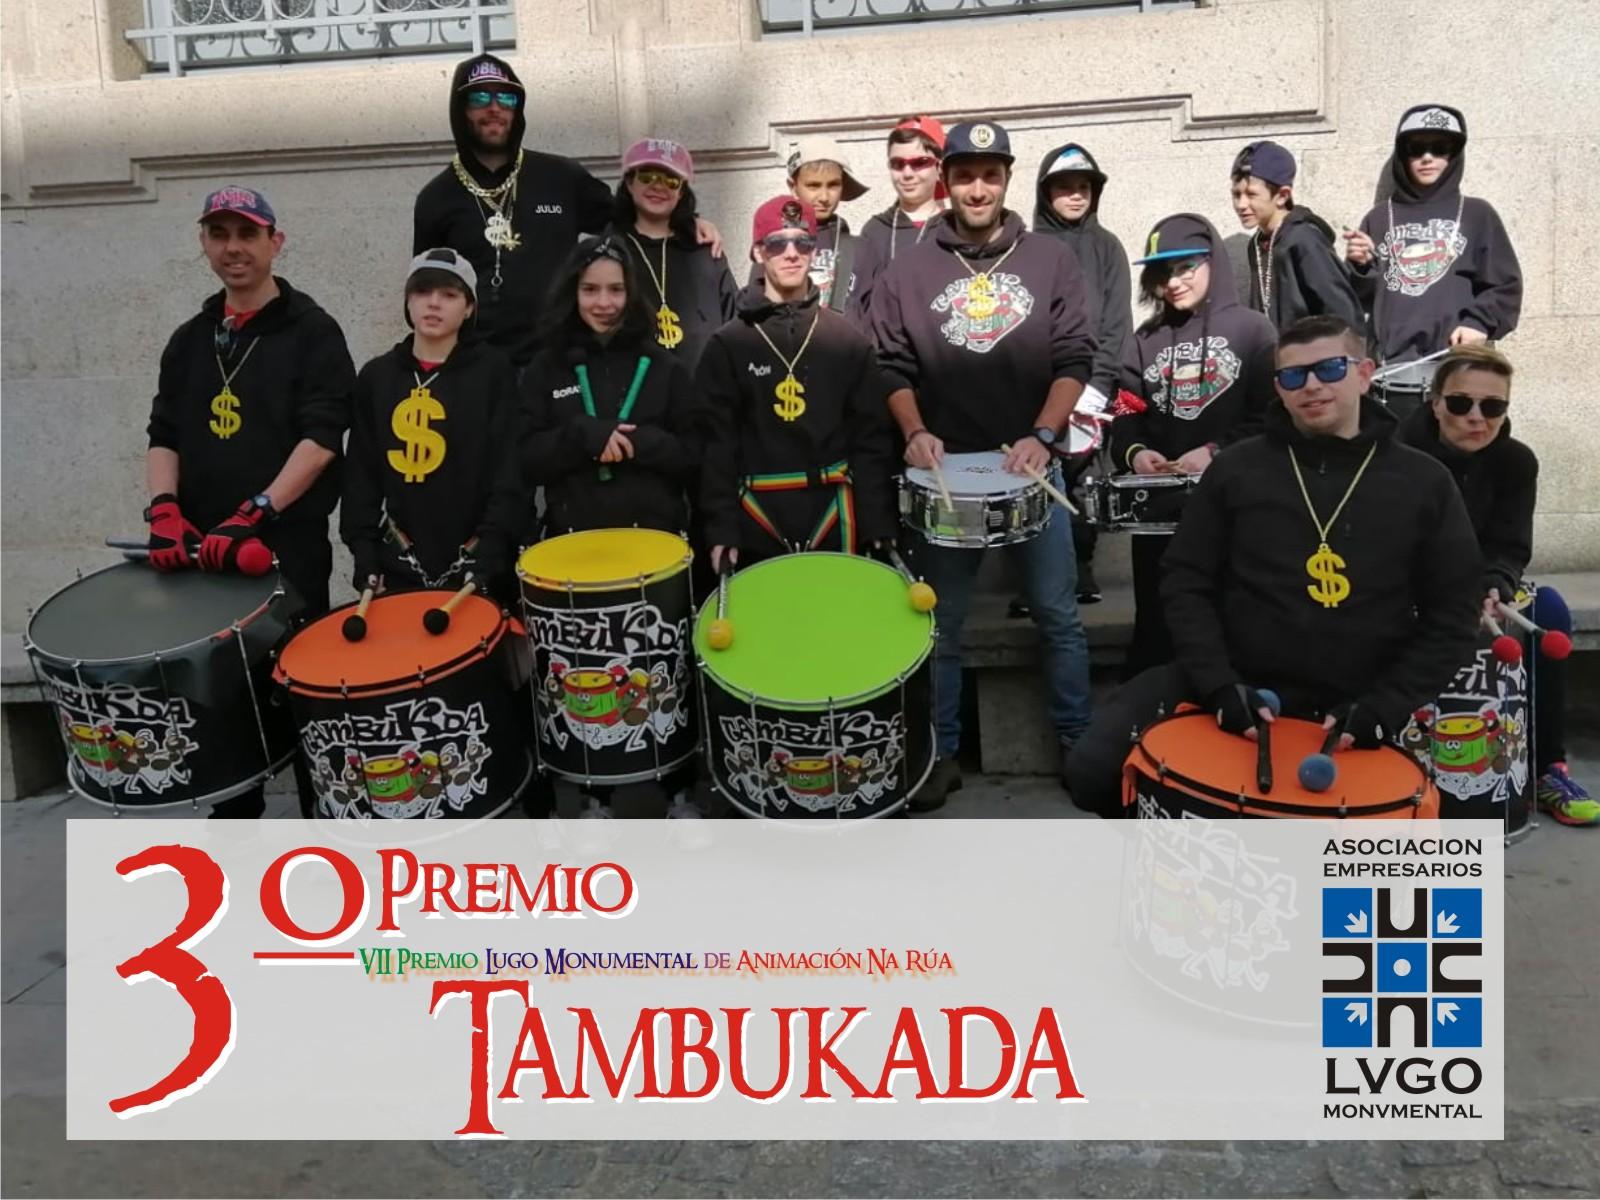 3 - Tambukada